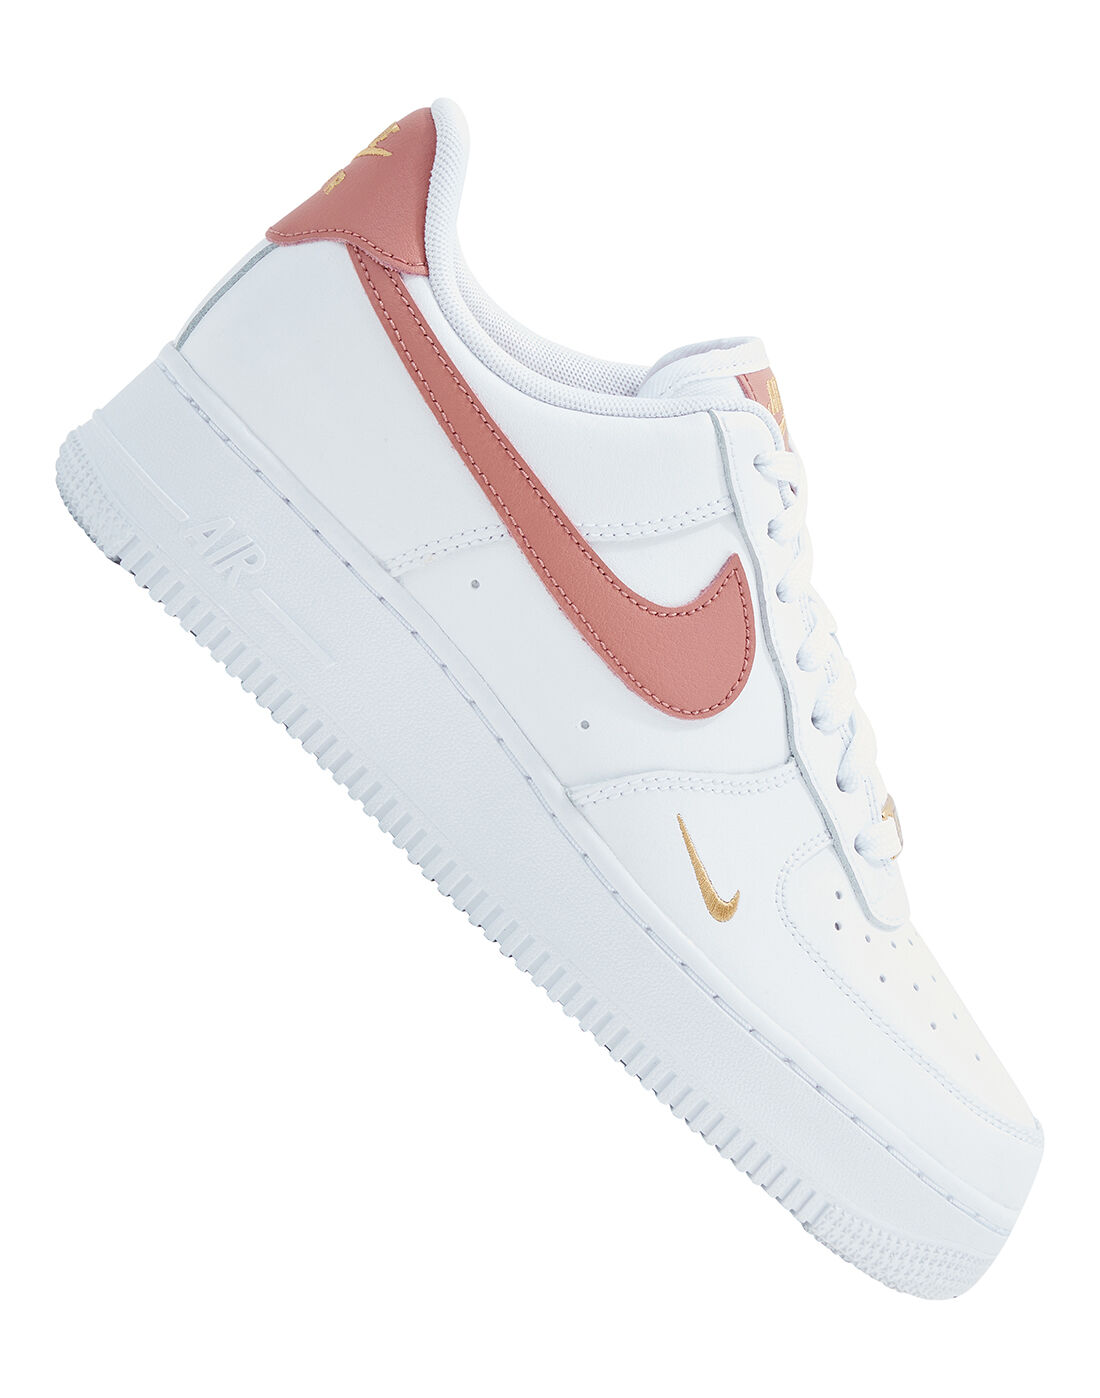 Nike Womens chaussure foot salle adidas boots girls women shoe 07 ...